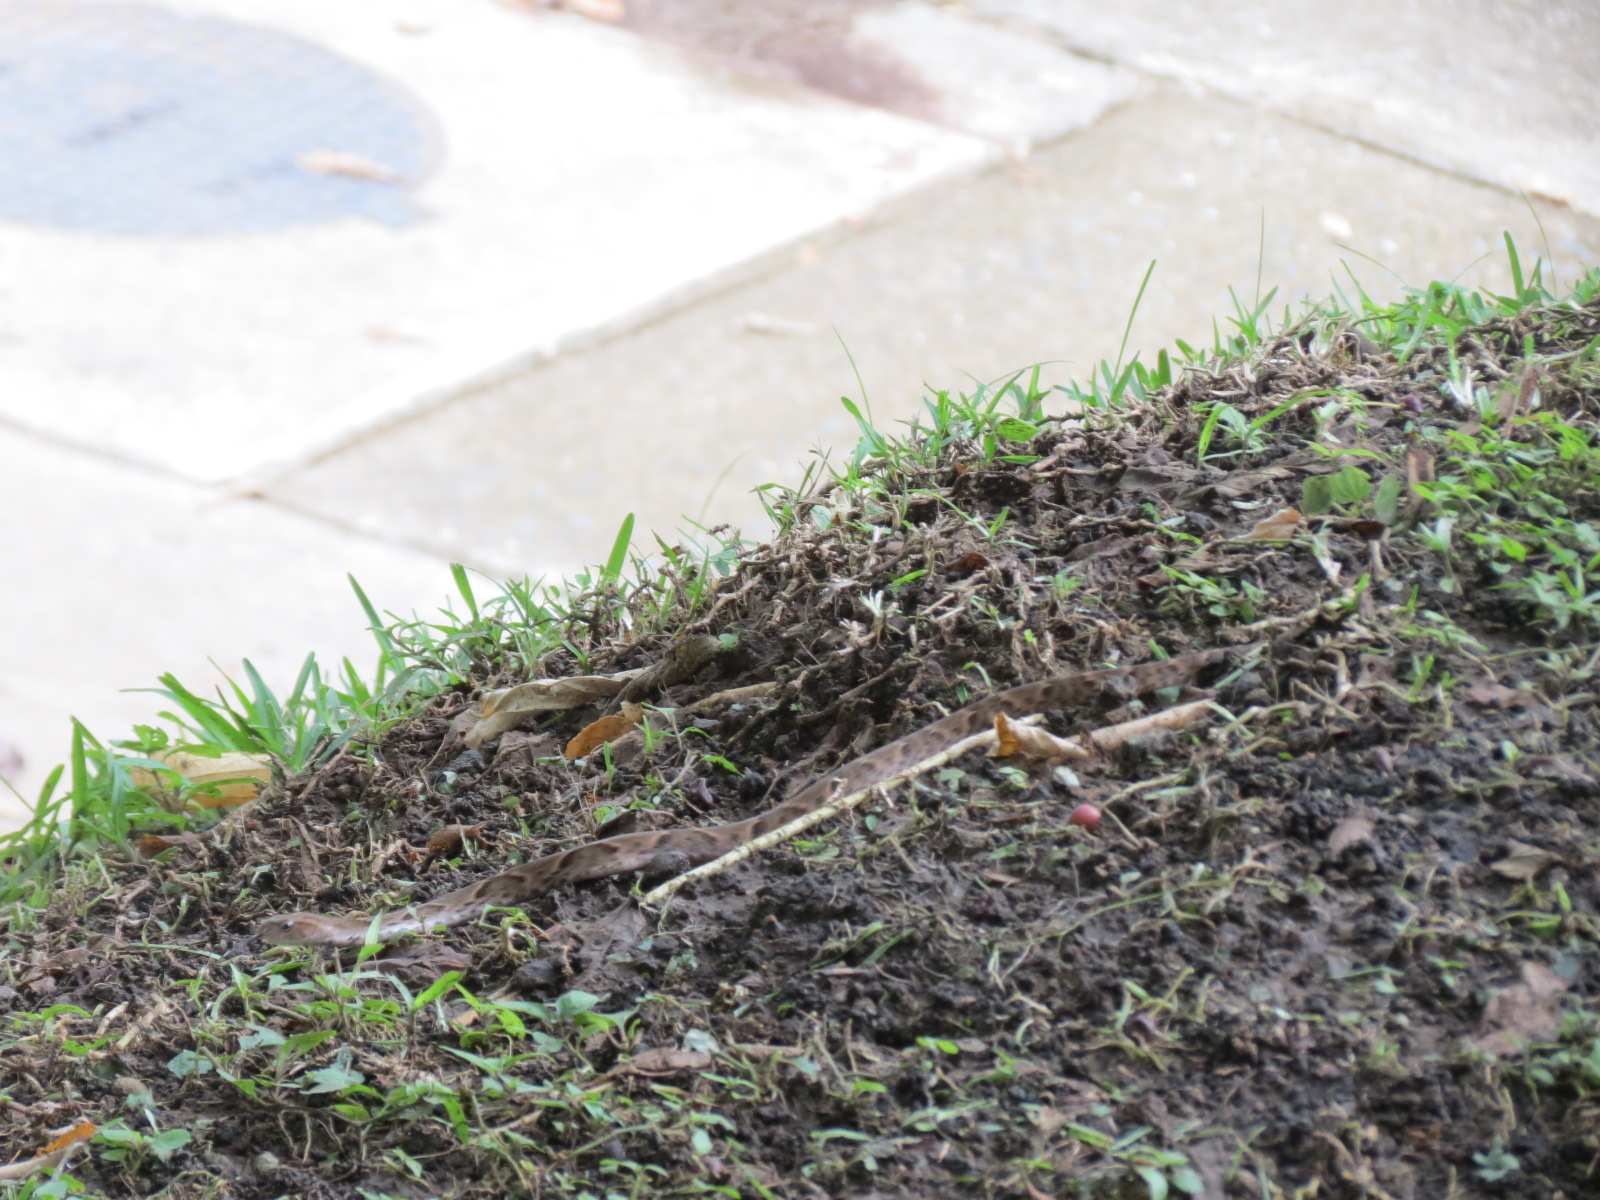 youth and biodiversity venomous fer de lance snake in my backyard